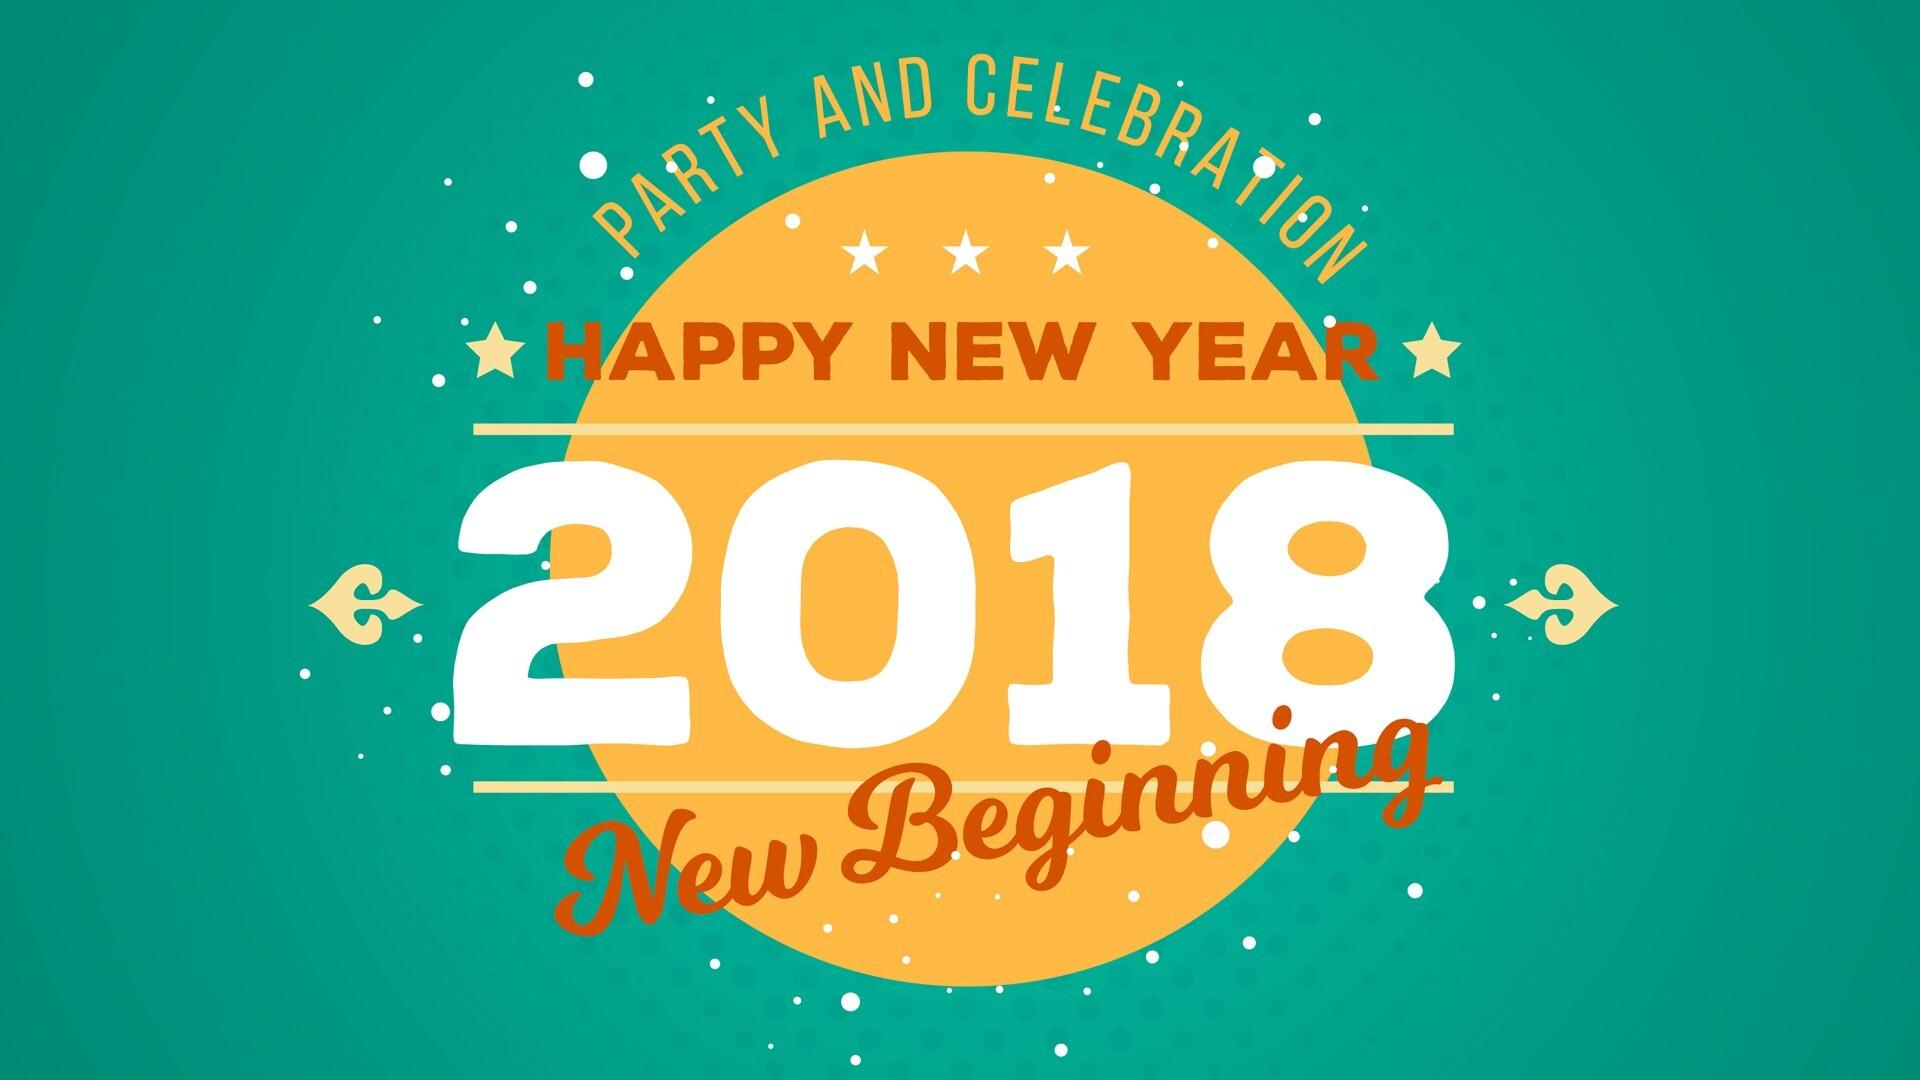 New year wallpaper 2018